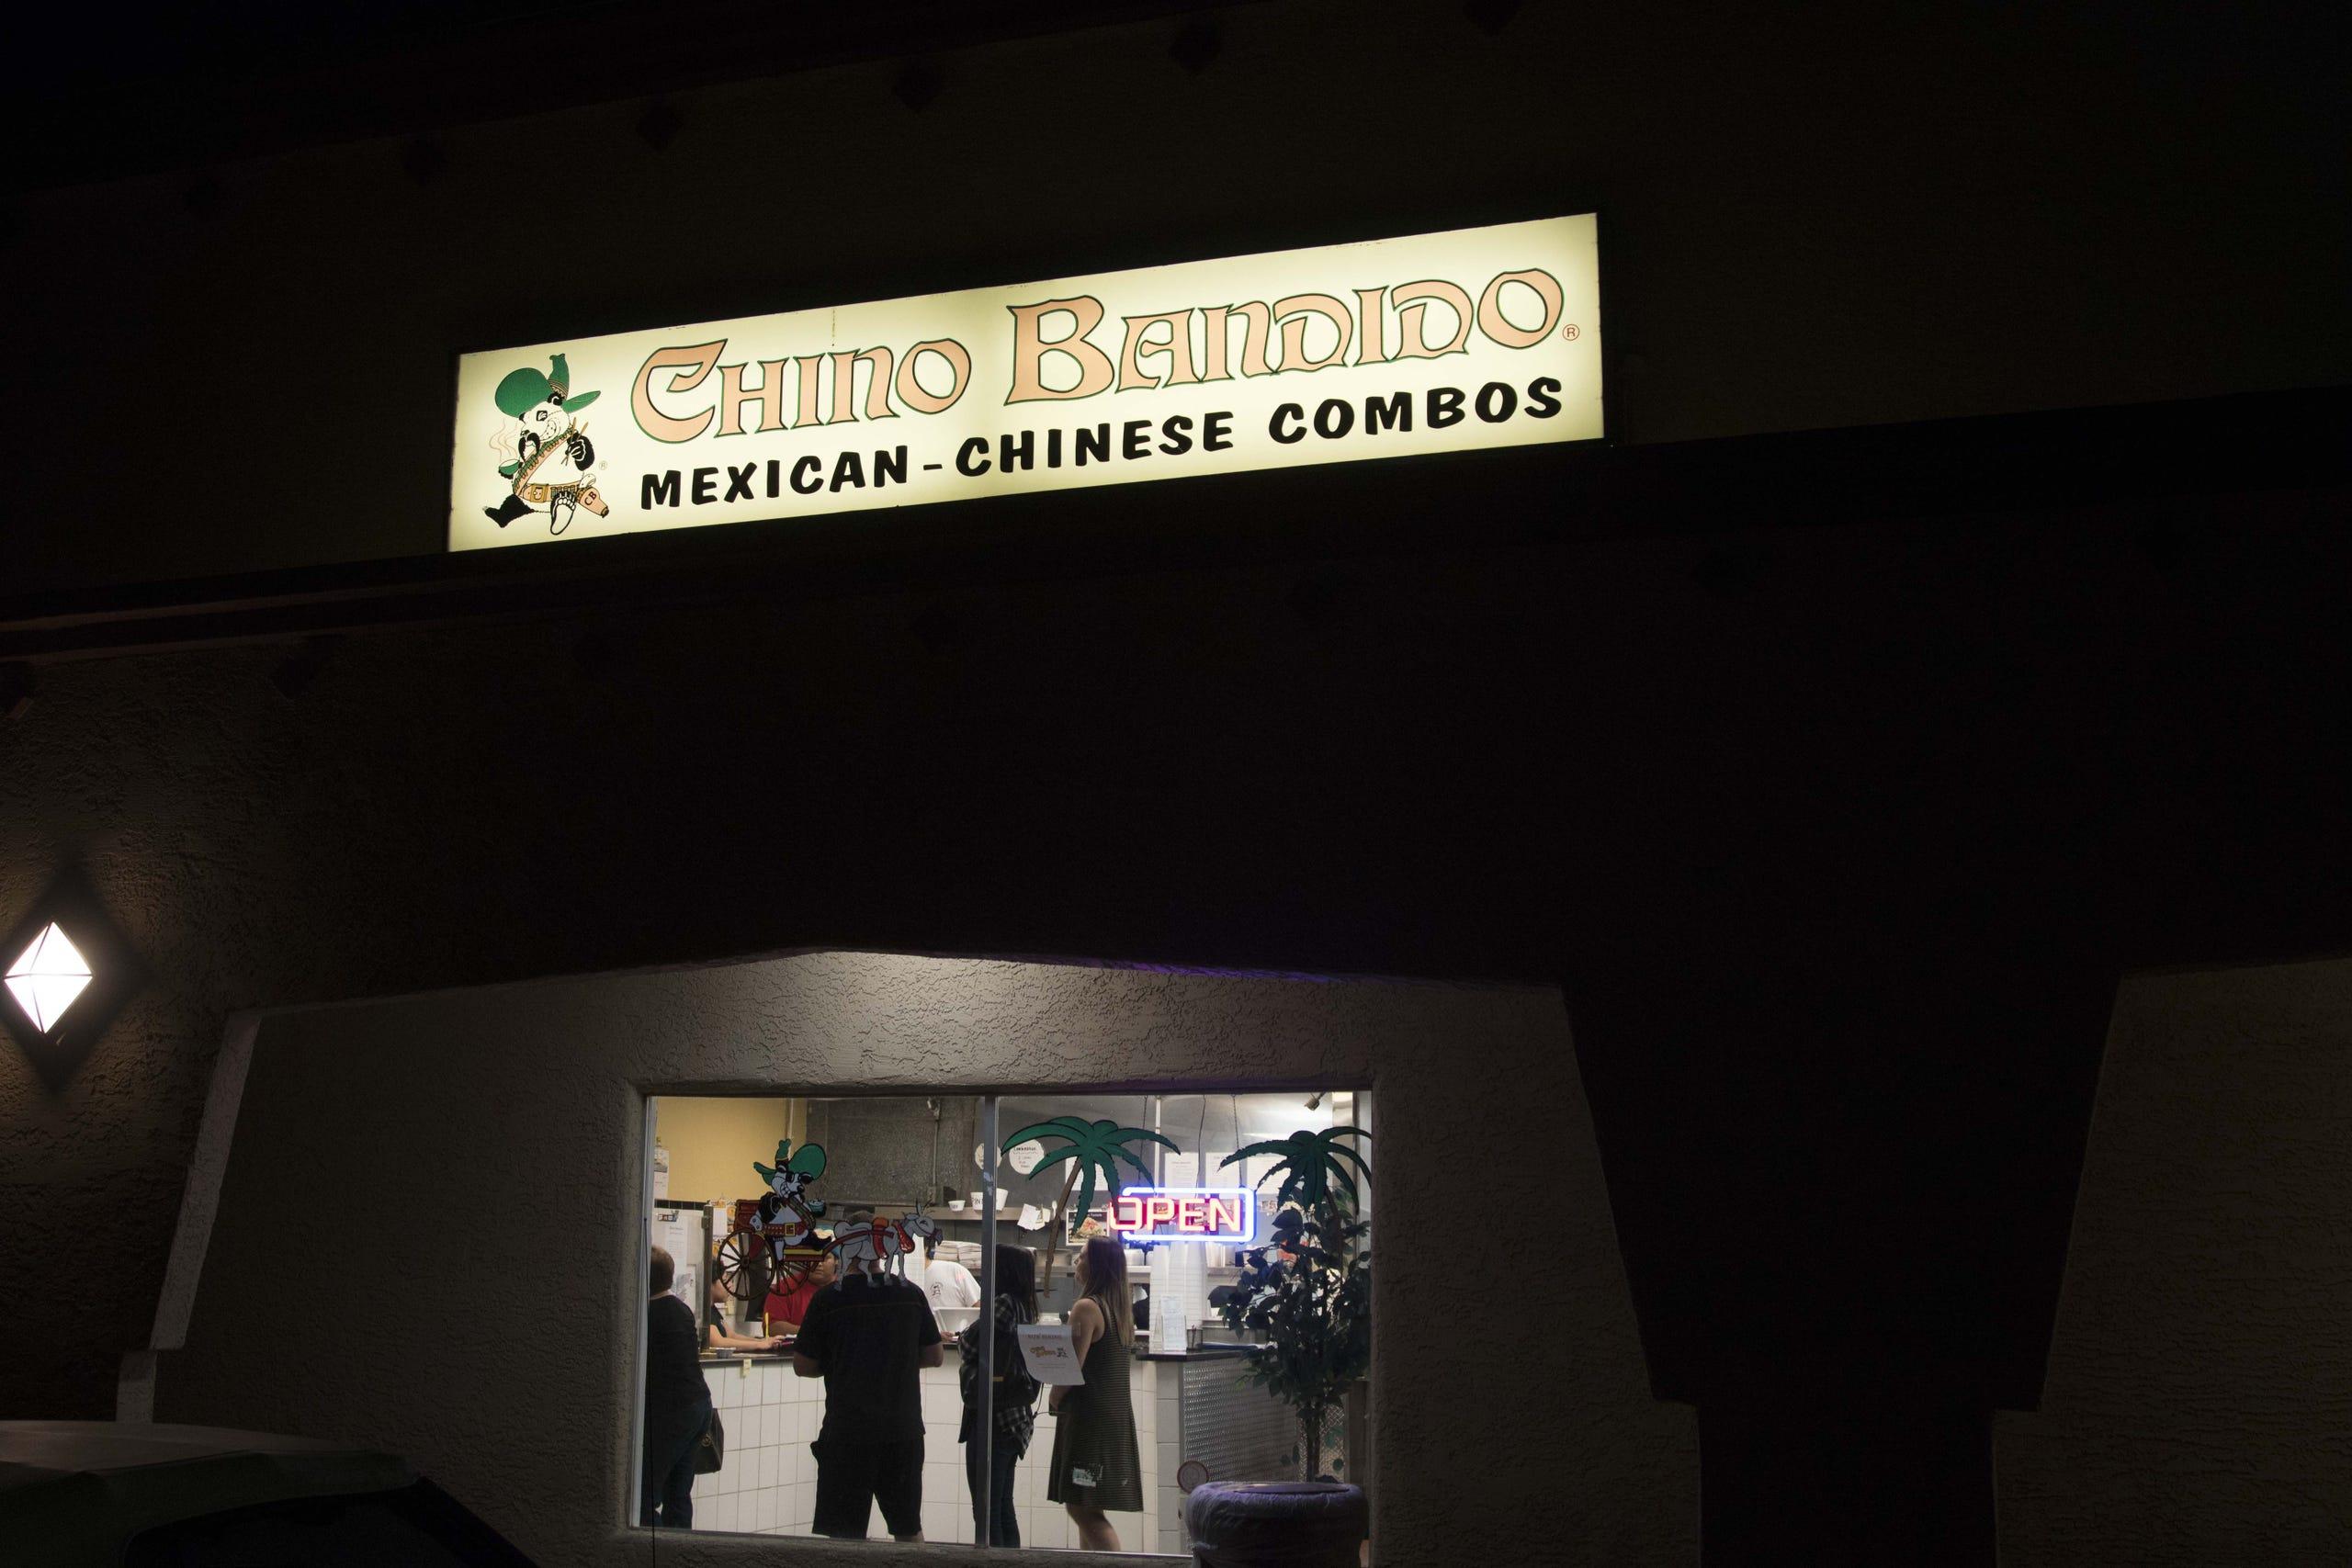 Chino Bandido restaurant owner Eve Collins